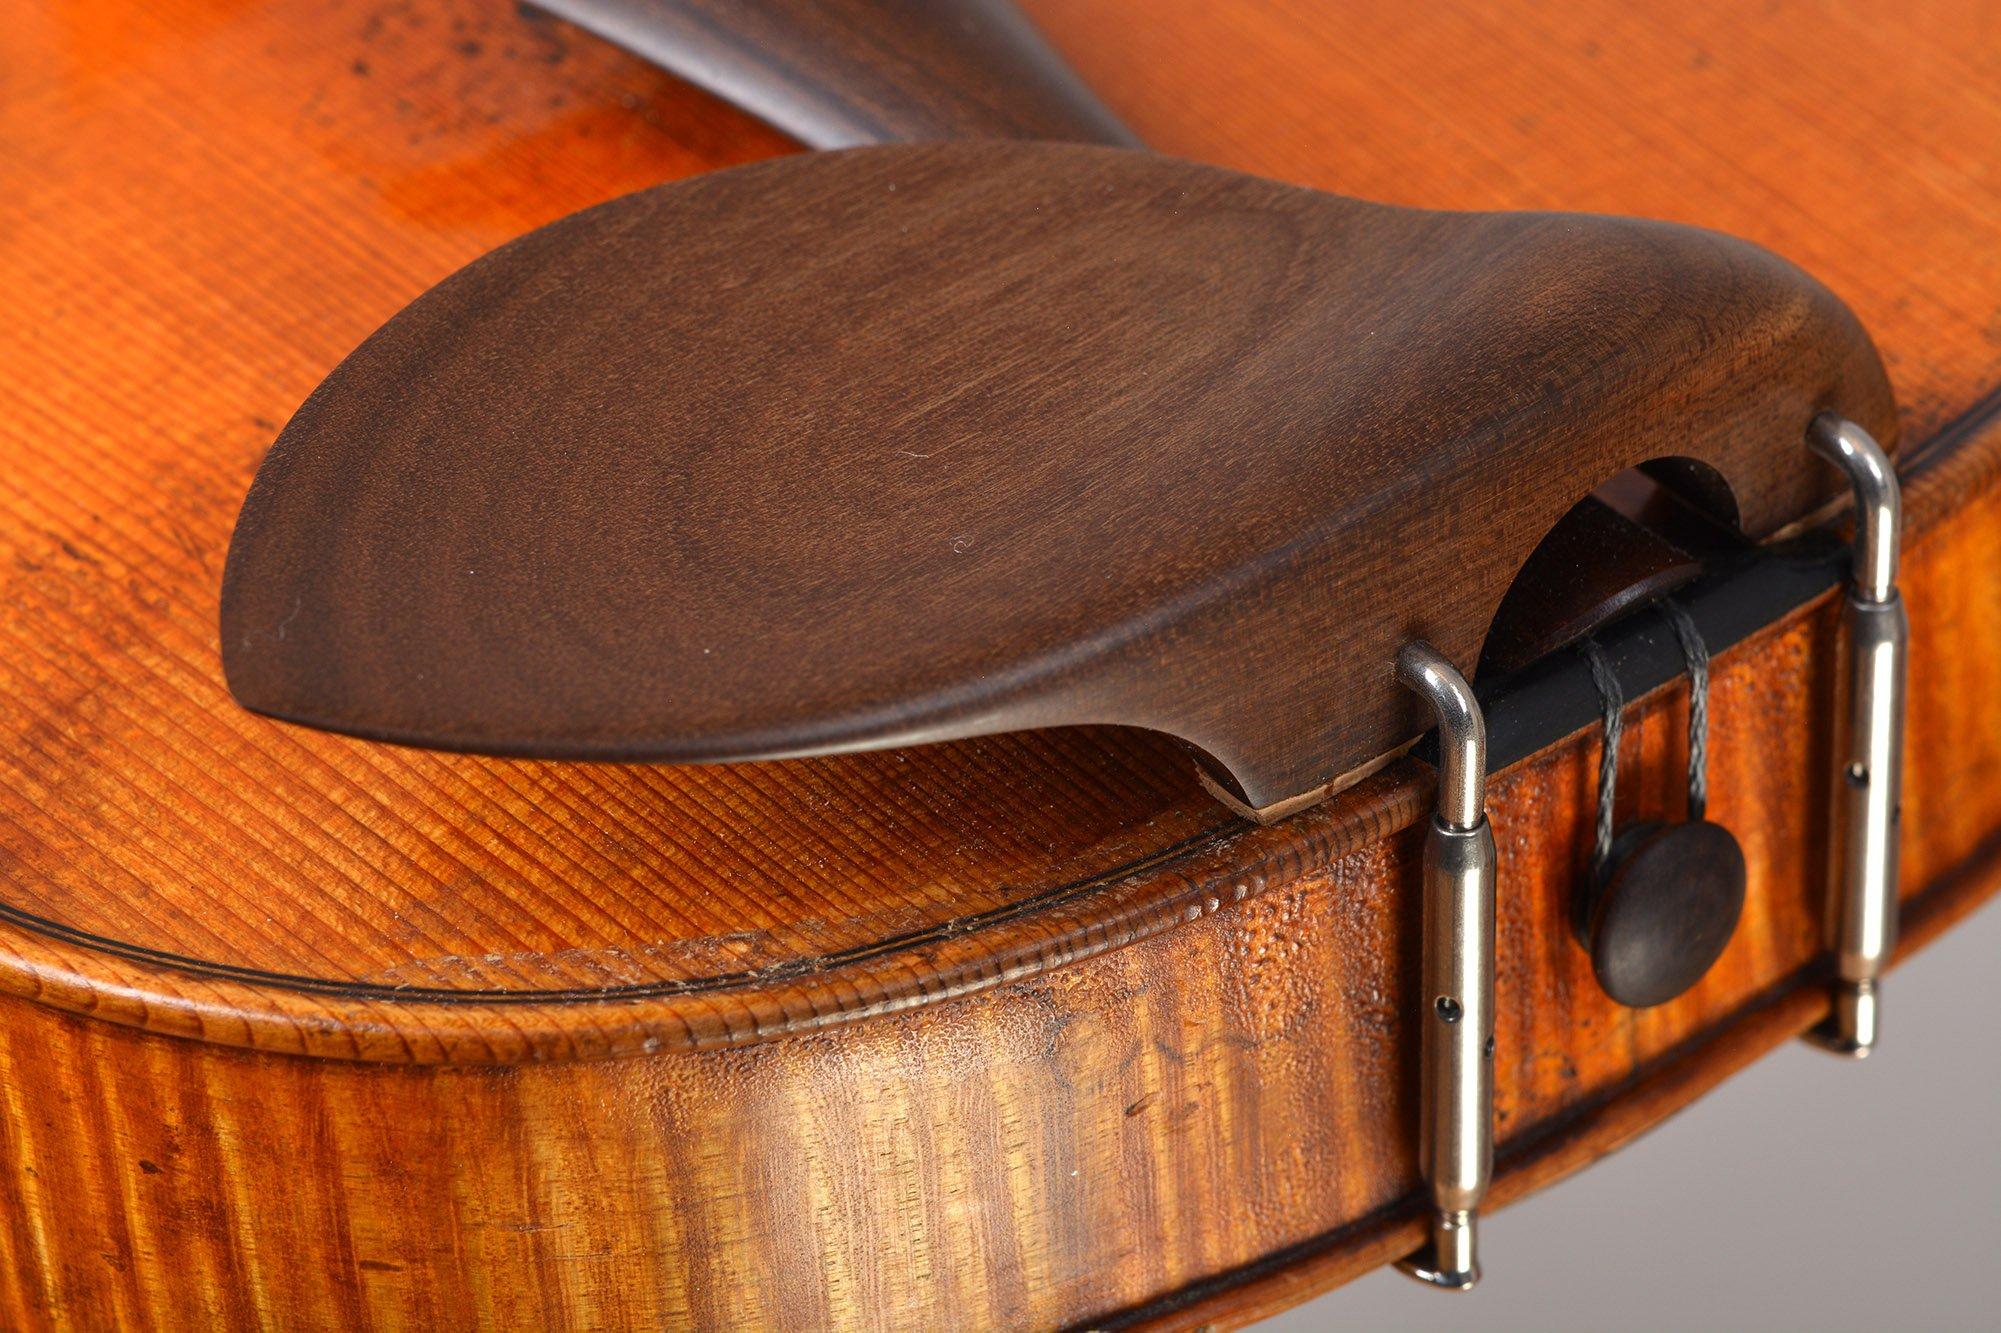 Chinrest from Sonowood maple made by Wilhelm Geigenbau